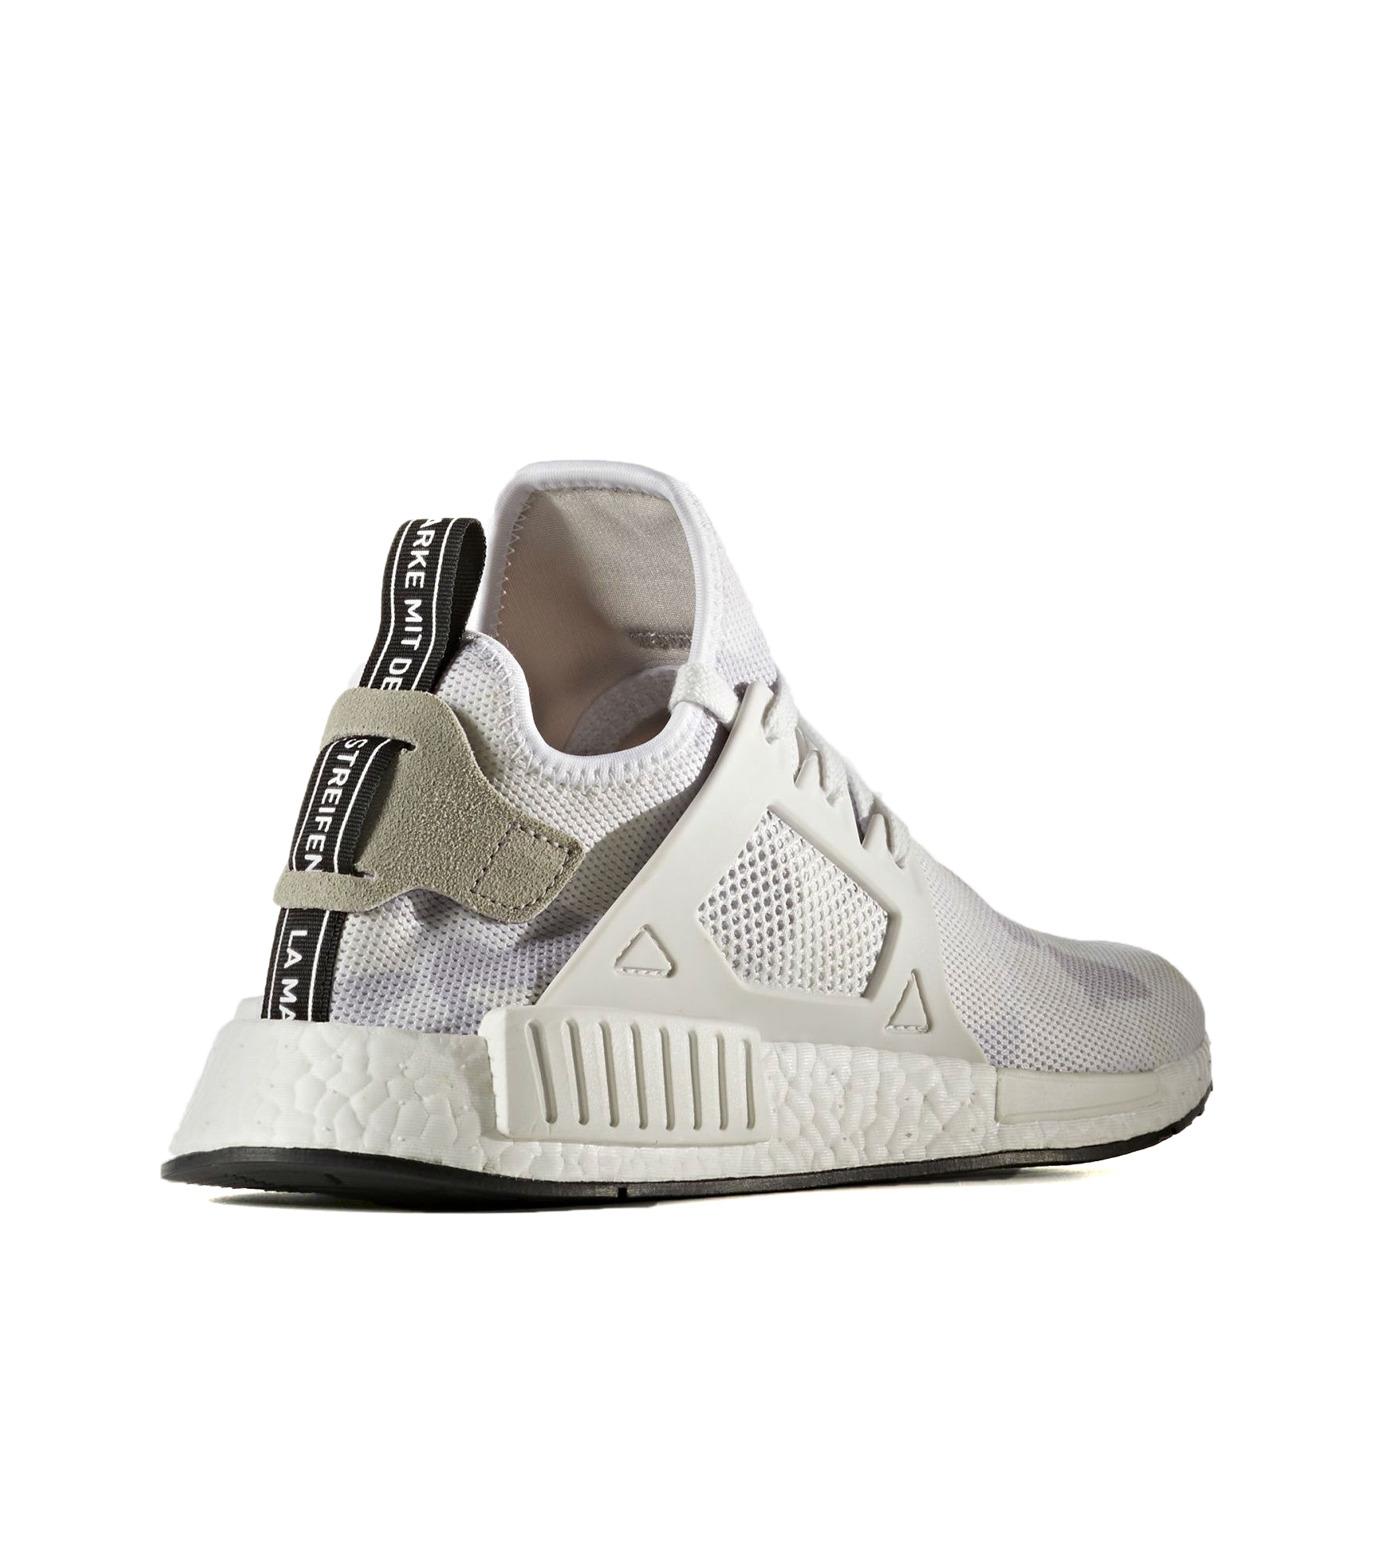 adidas(アディダス)のNMD XR1-WHITE(シューズ/shoes)-BA7233-4 拡大詳細画像4